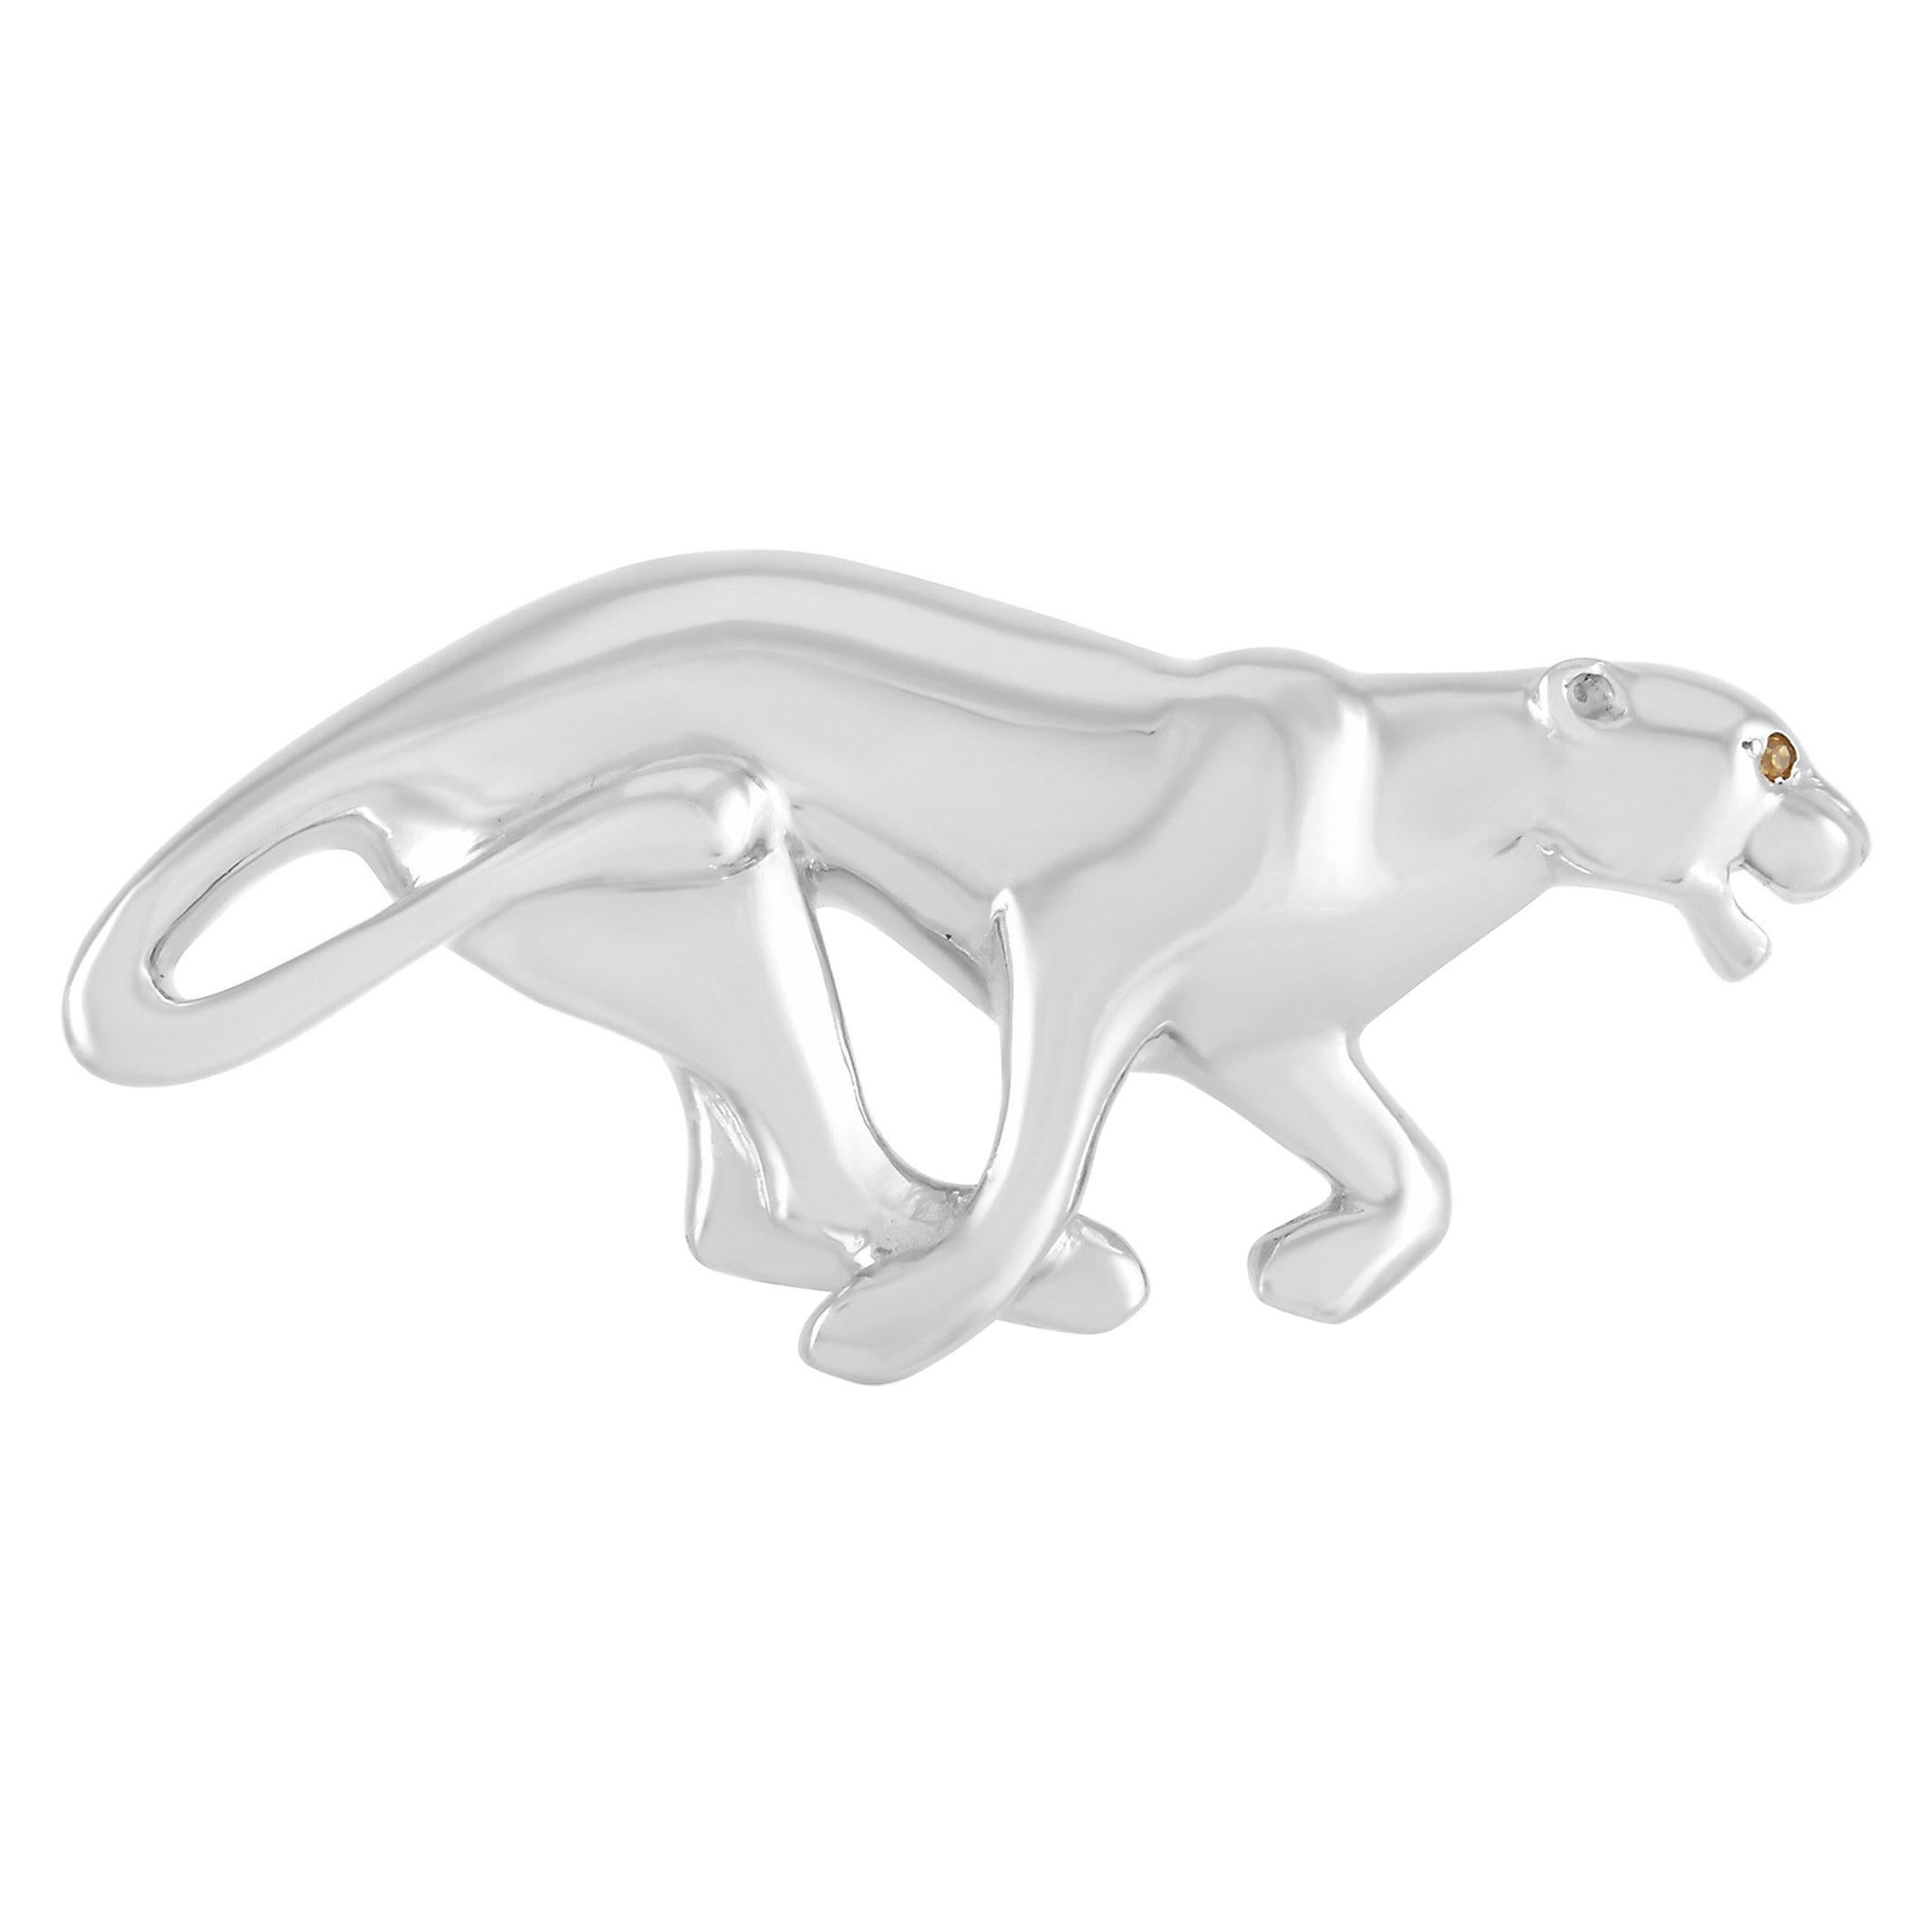 Cartier Panthère 18K White Gold Brooch